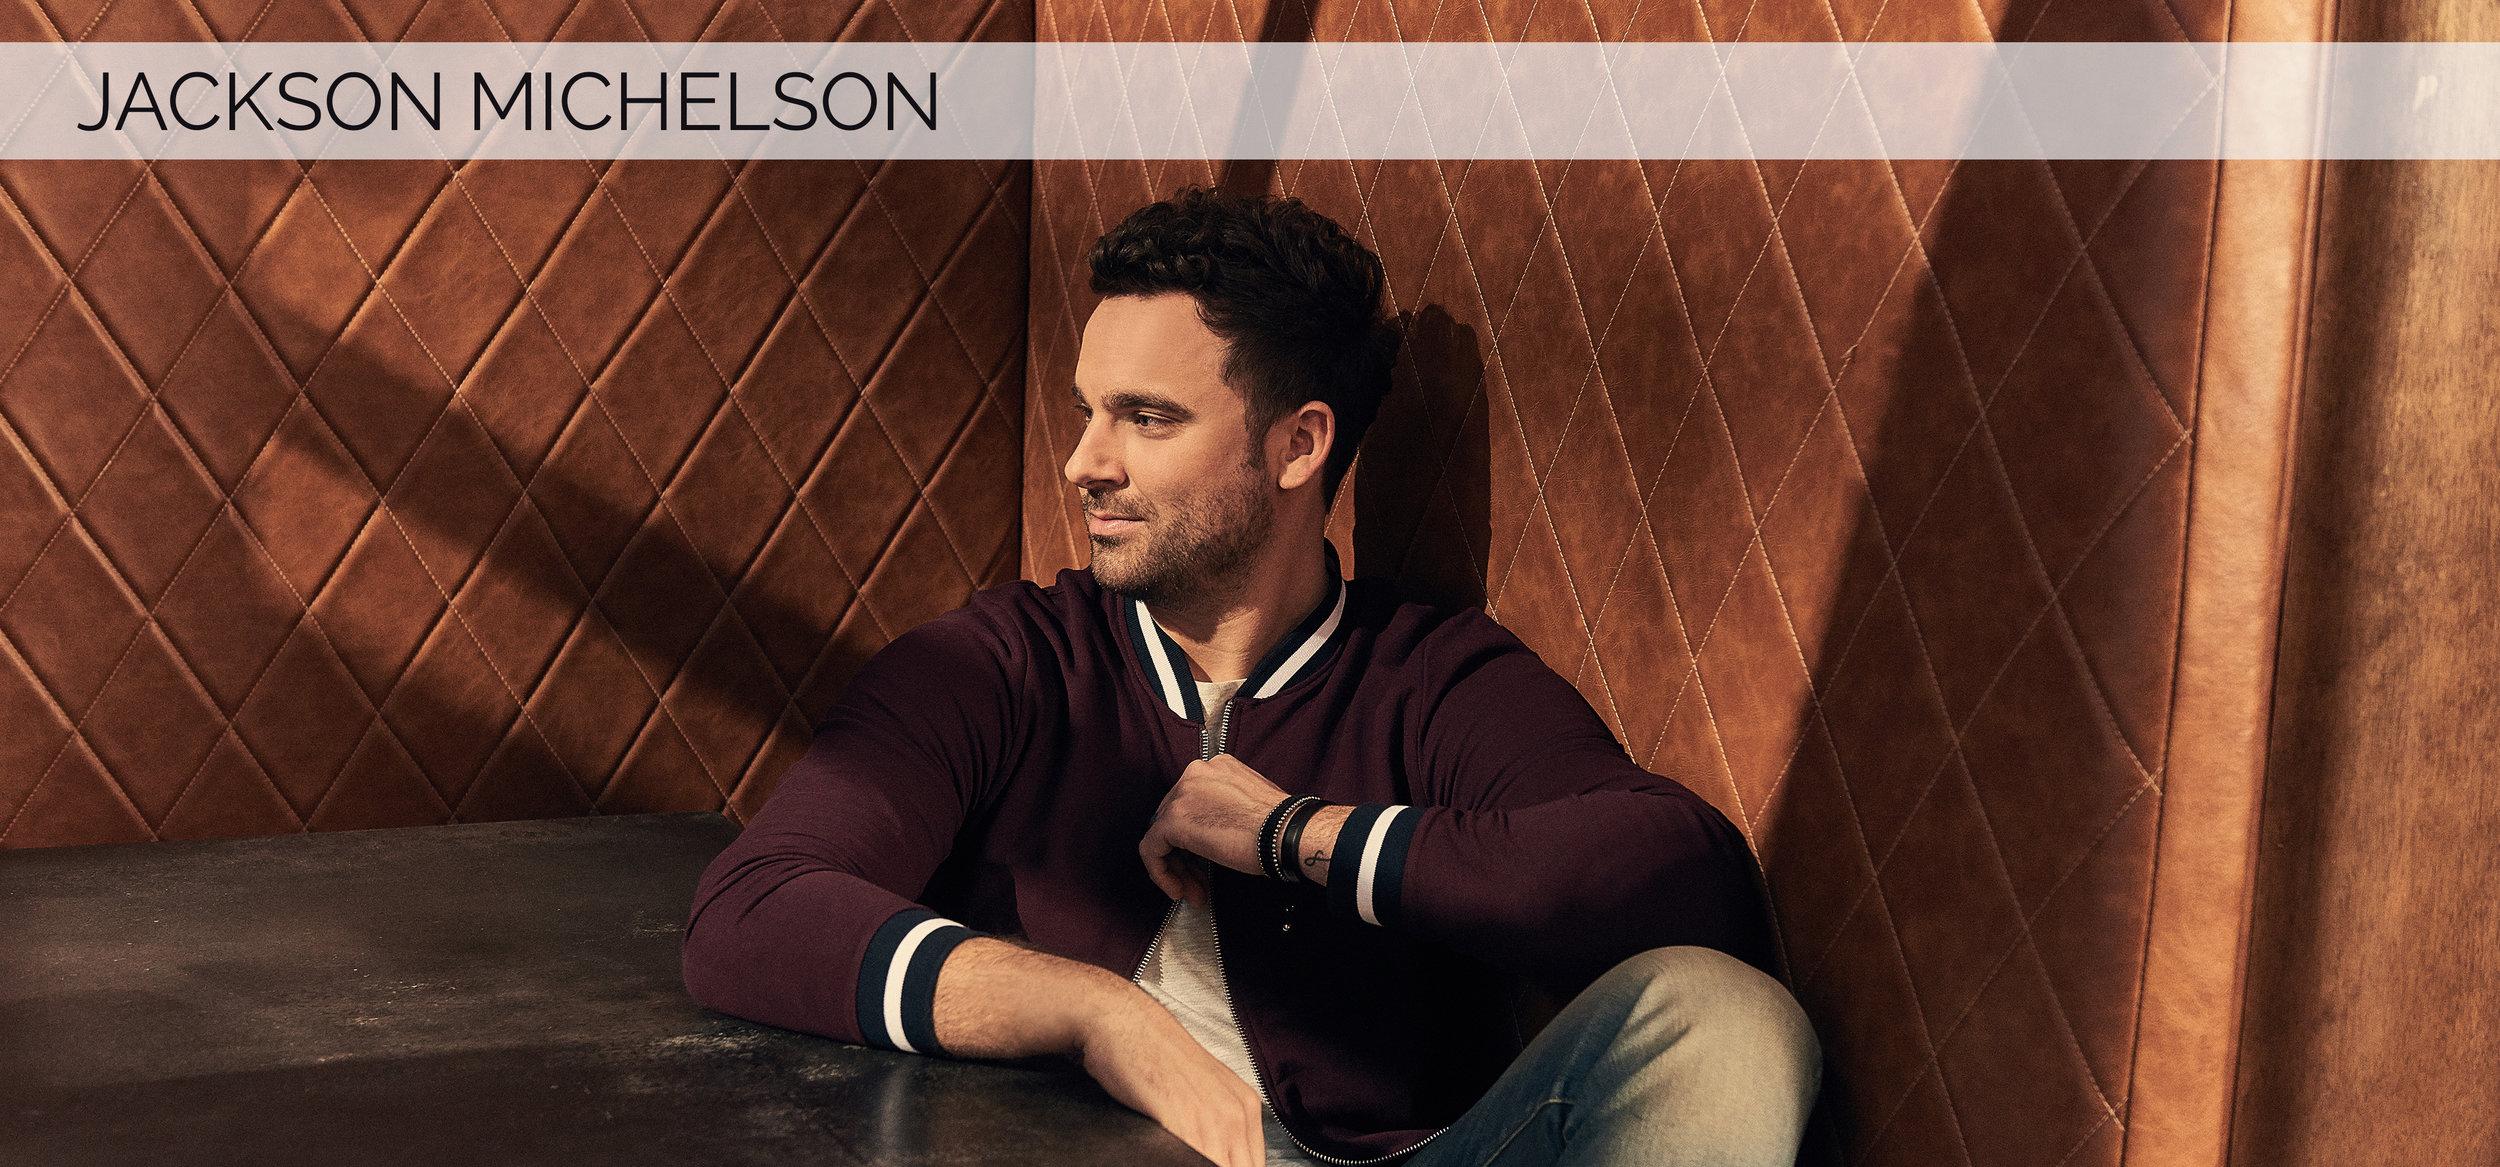 Jackson Michelson NMM Banner.jpg